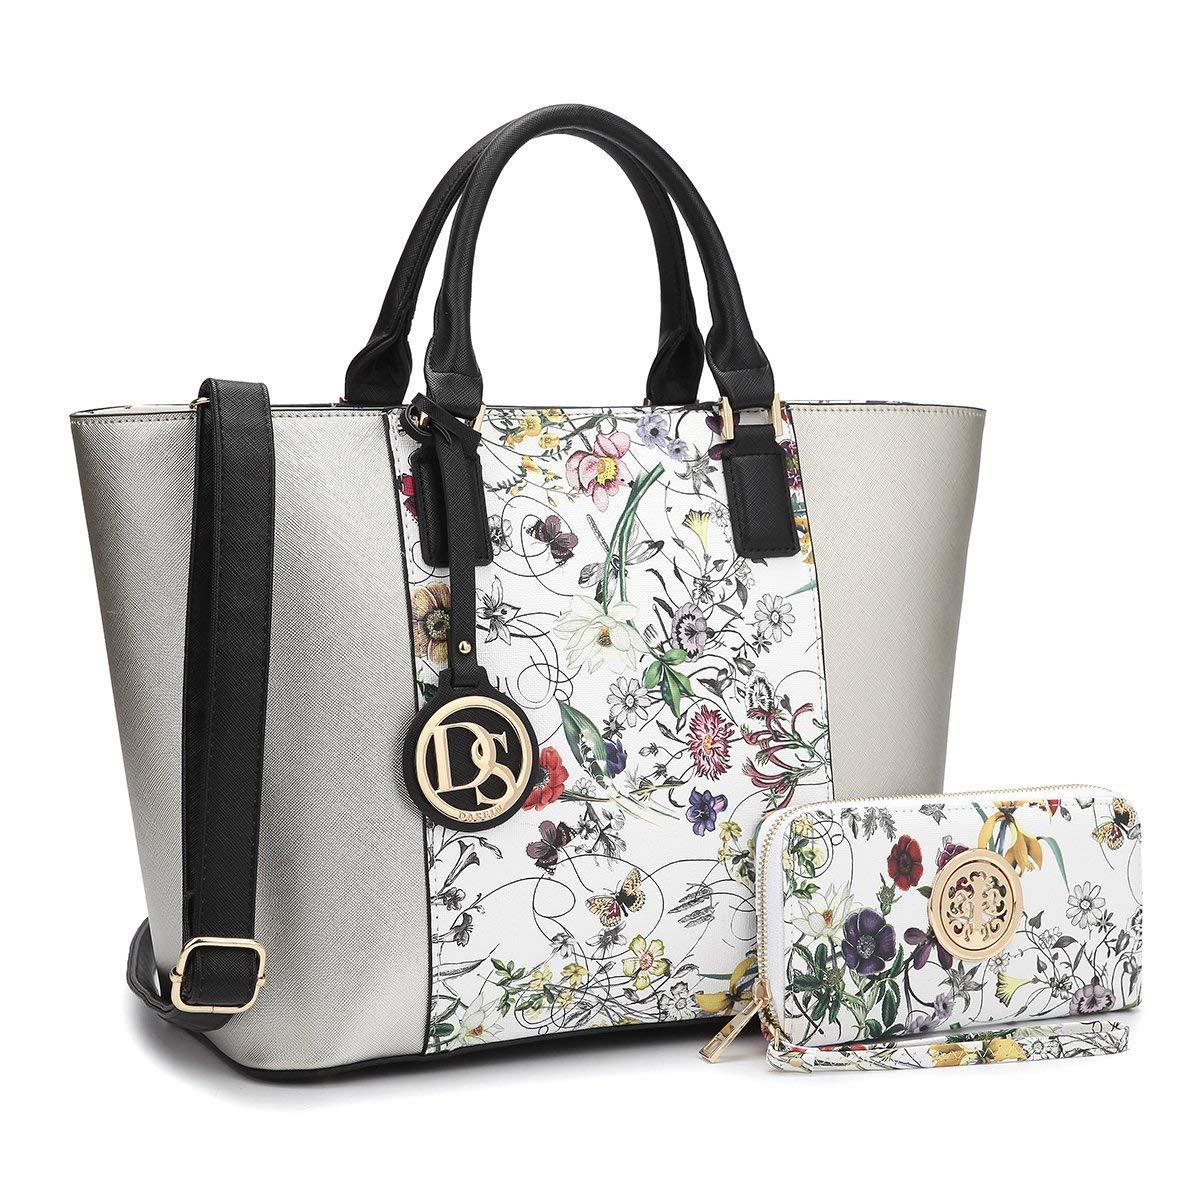 Get Quotations · MMK Collection Designer women Handbag wallet Set Fashion  Tote purse Top handle purse Shoulder bag Satchel e48aff74f5